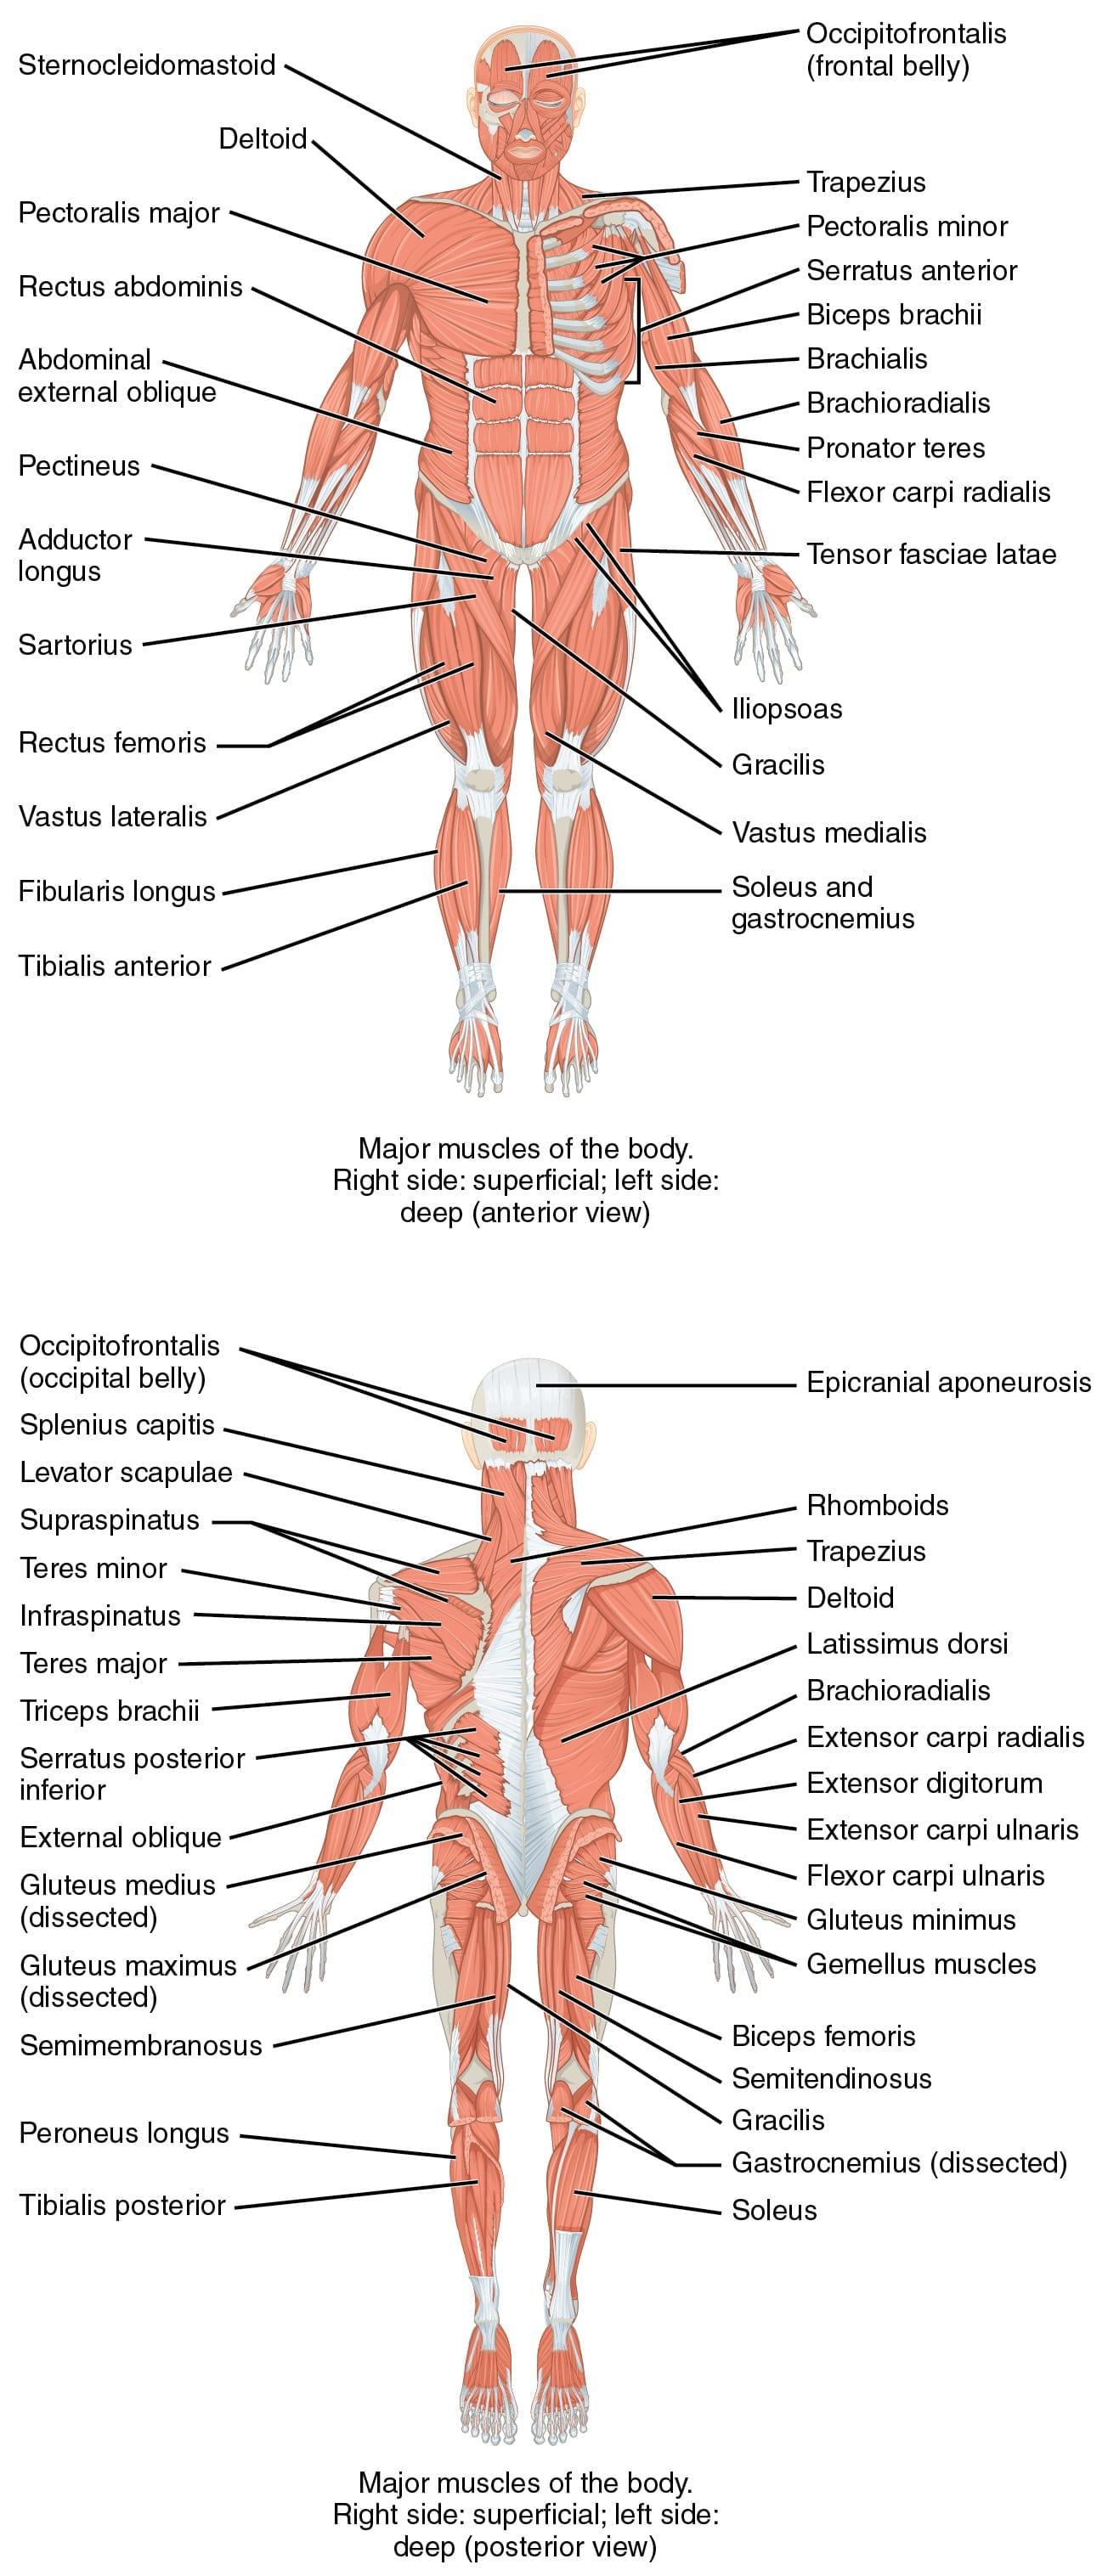 Unit 5 muscular system worksheet answer key